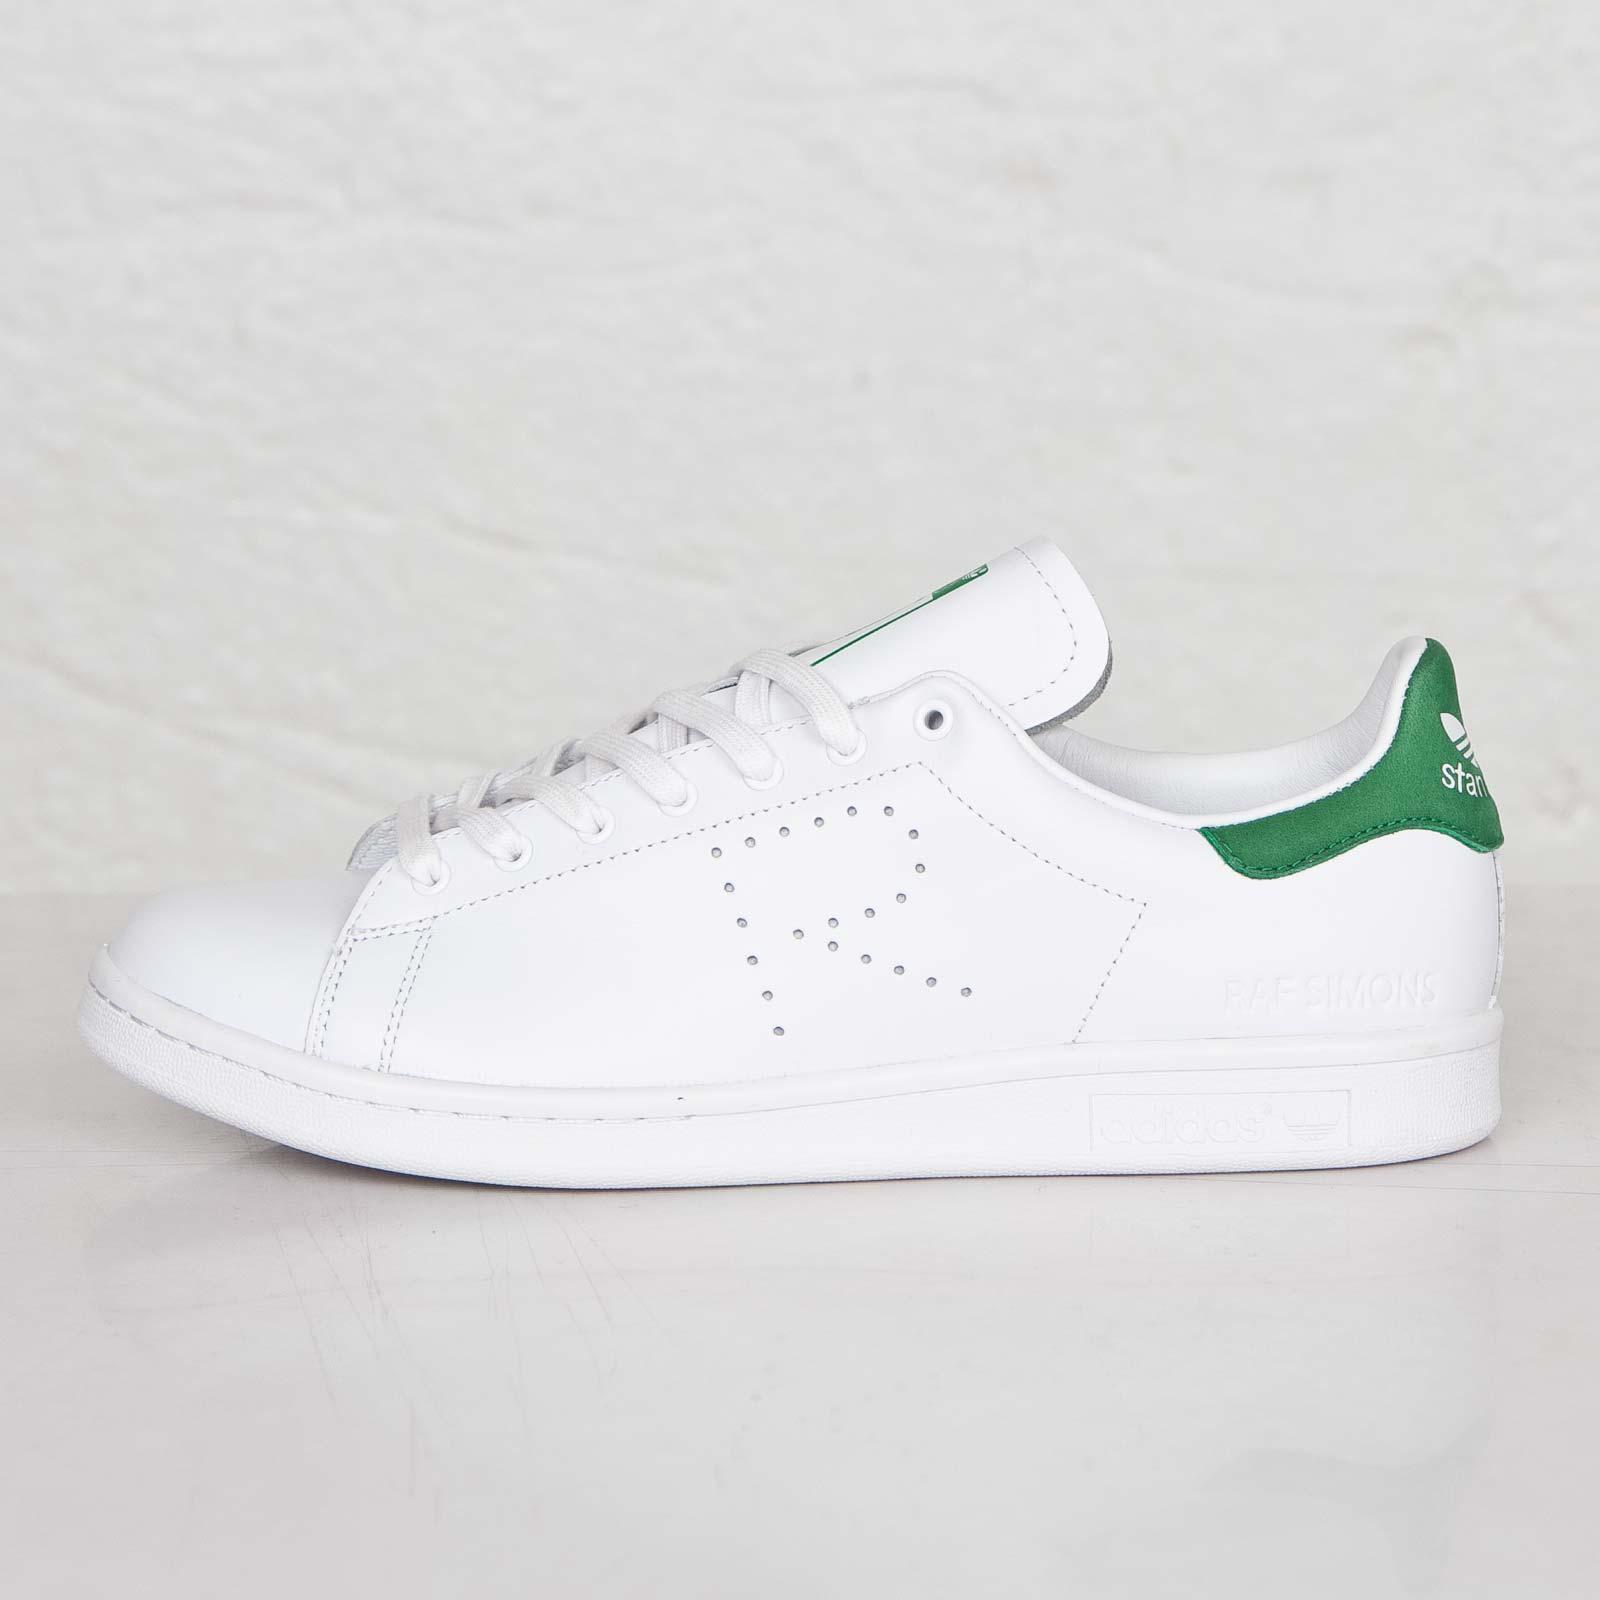 adidas Raf Simons Stan Smith - B24051 - SNS | sneakers ...